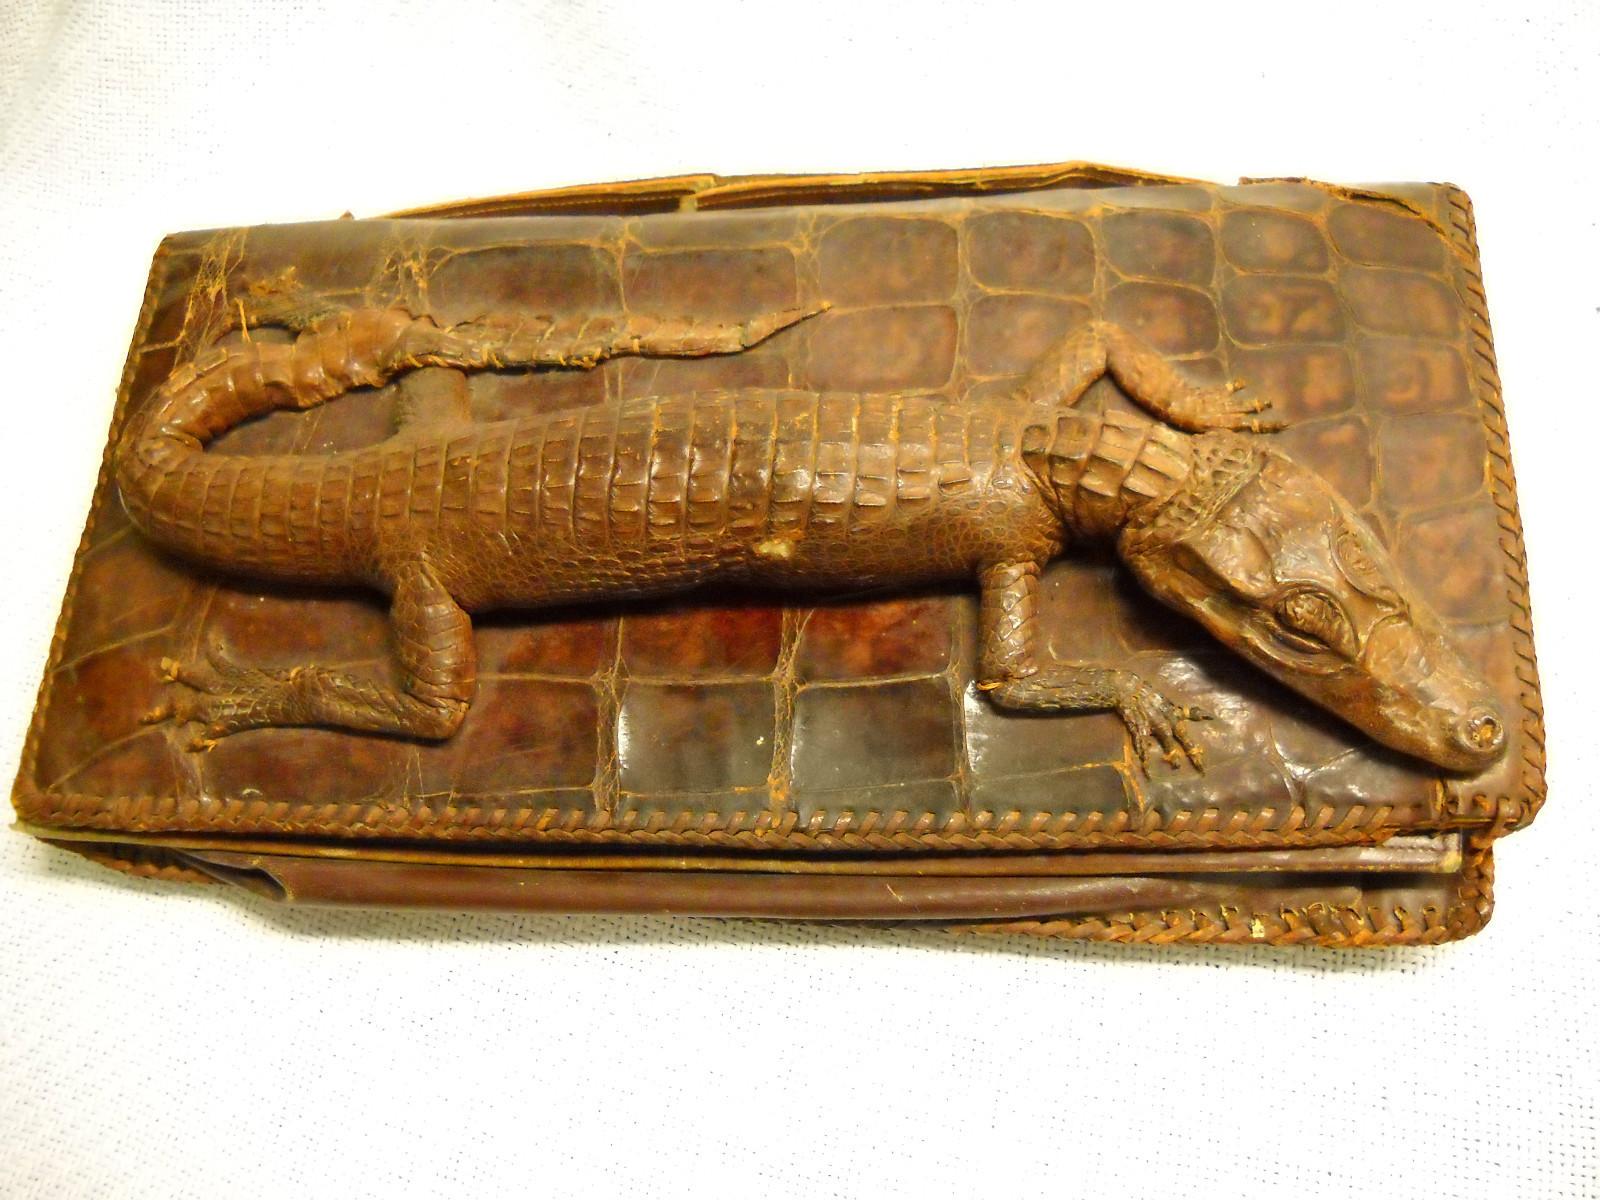 Vintage Alligator Purse Hand Bag Rare